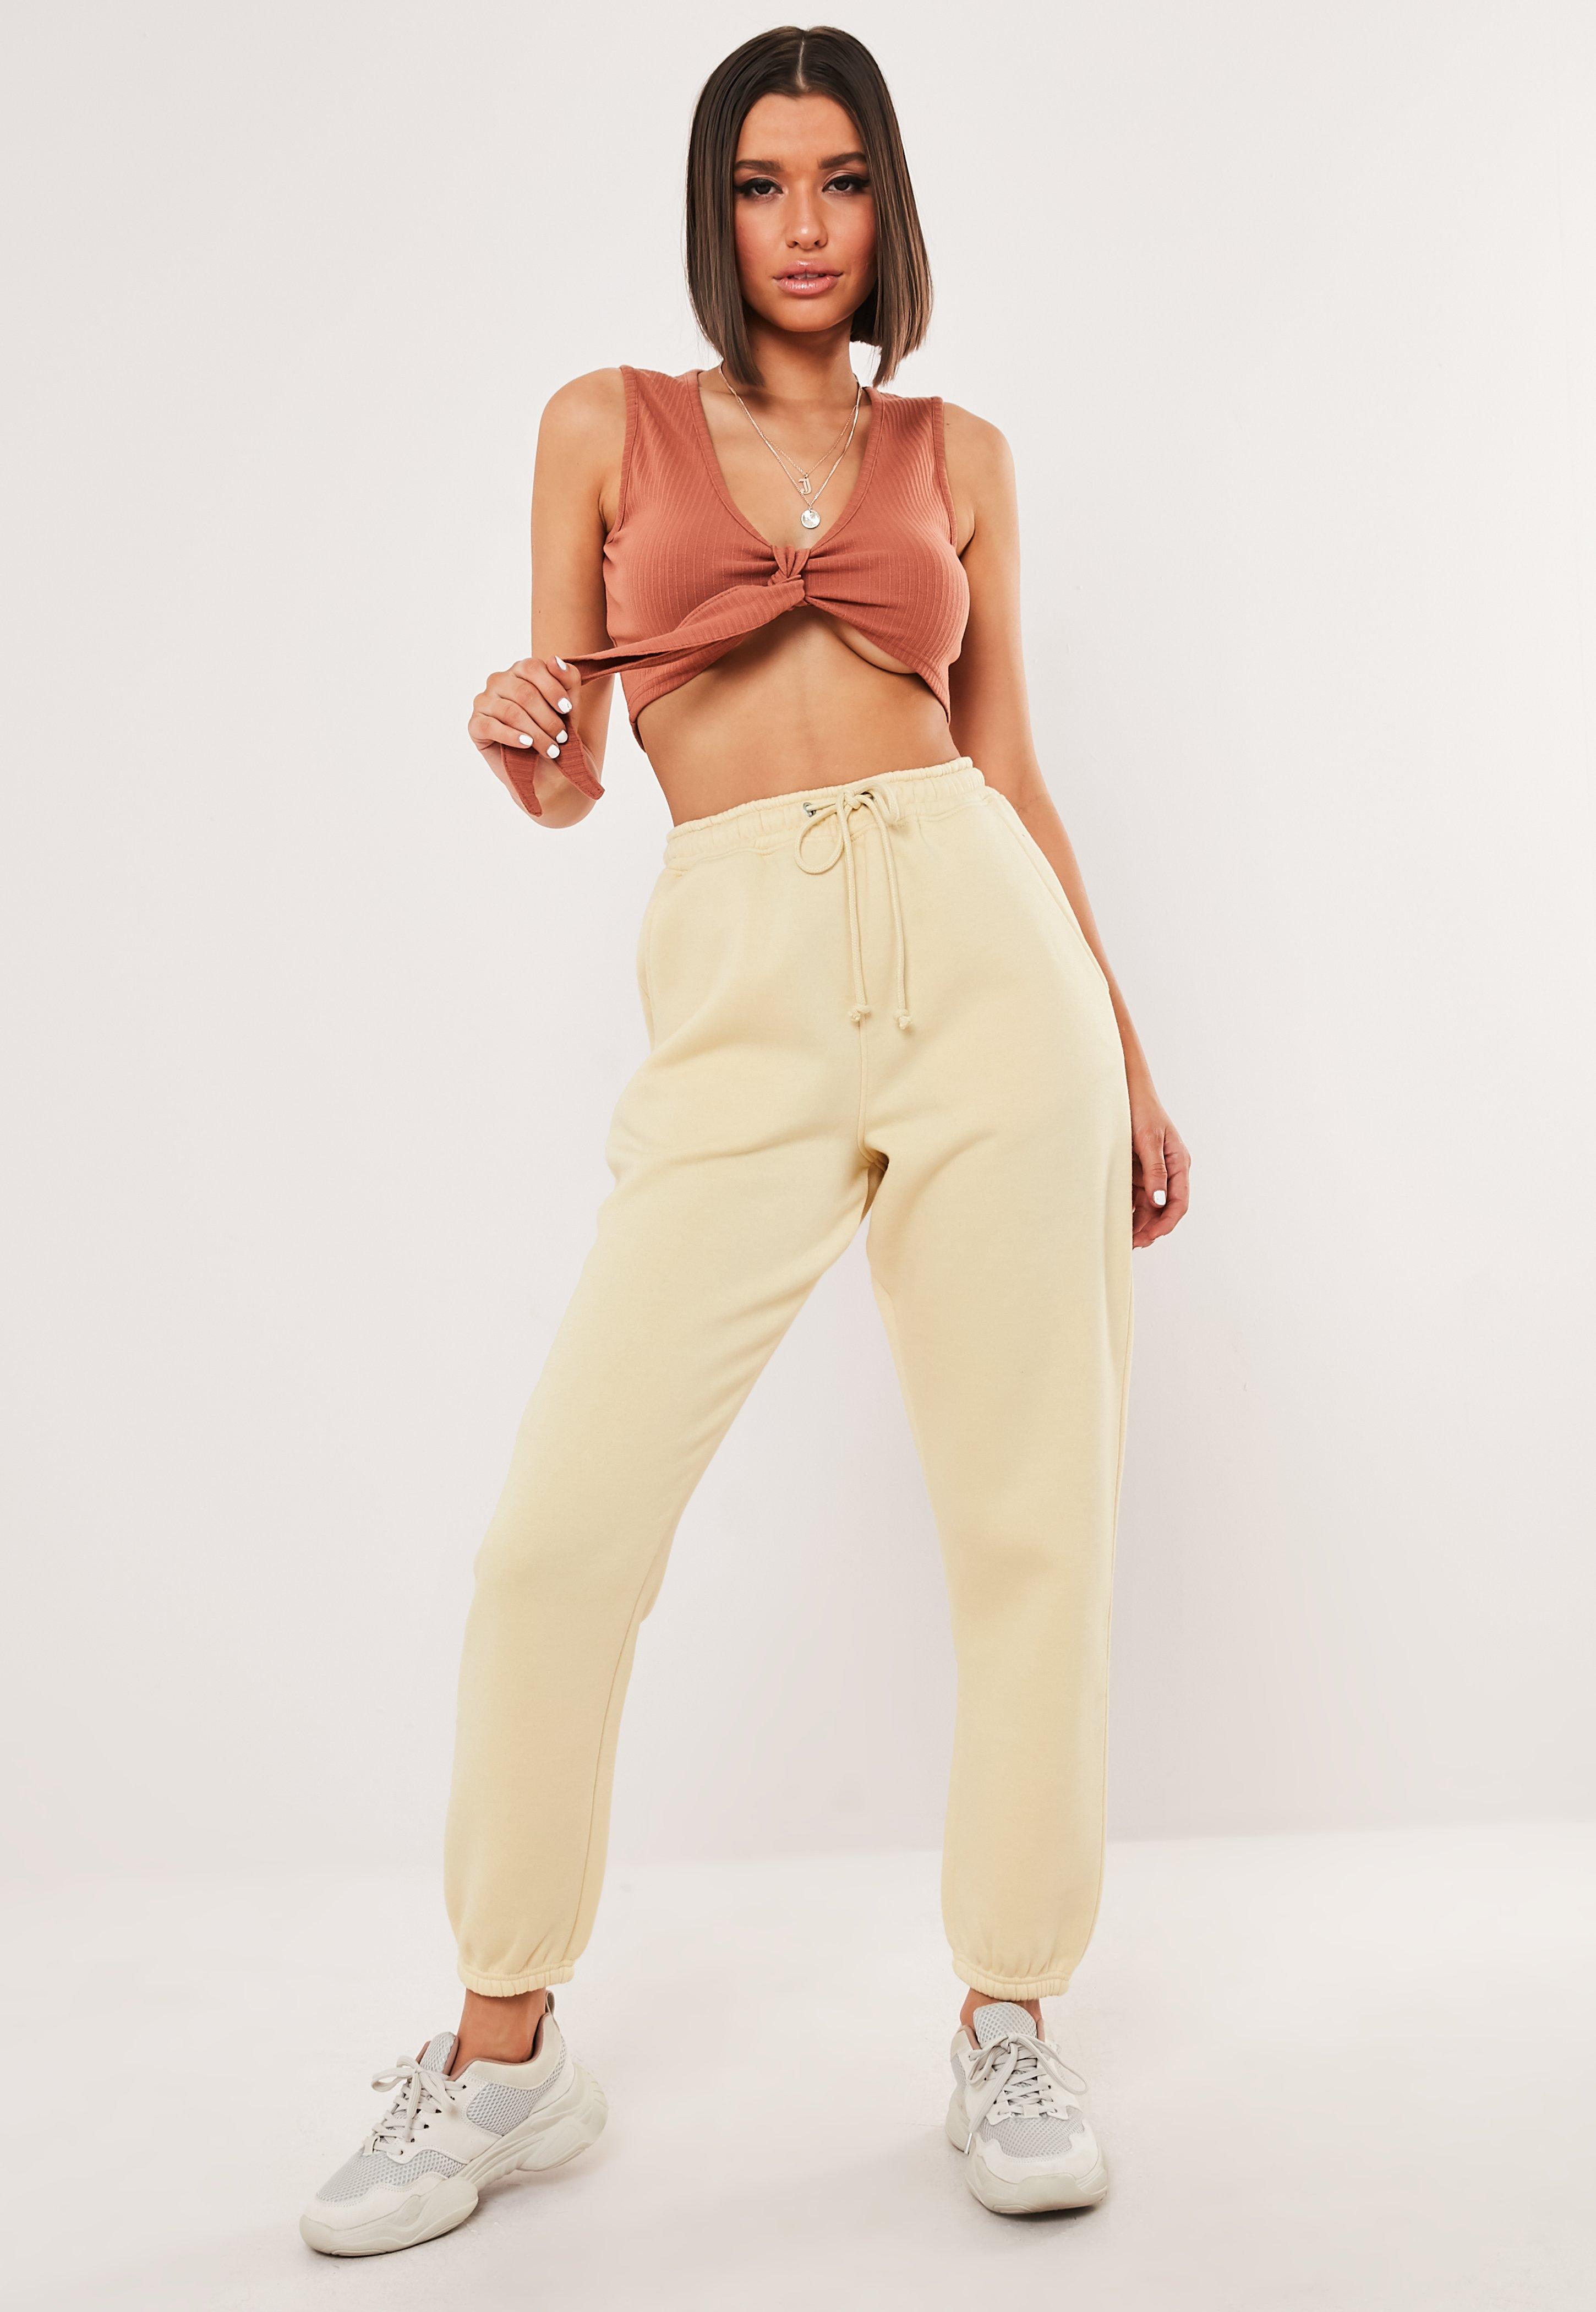 7d755ae4d957 Loungewear | Shop Loungewear Sets - Missguided